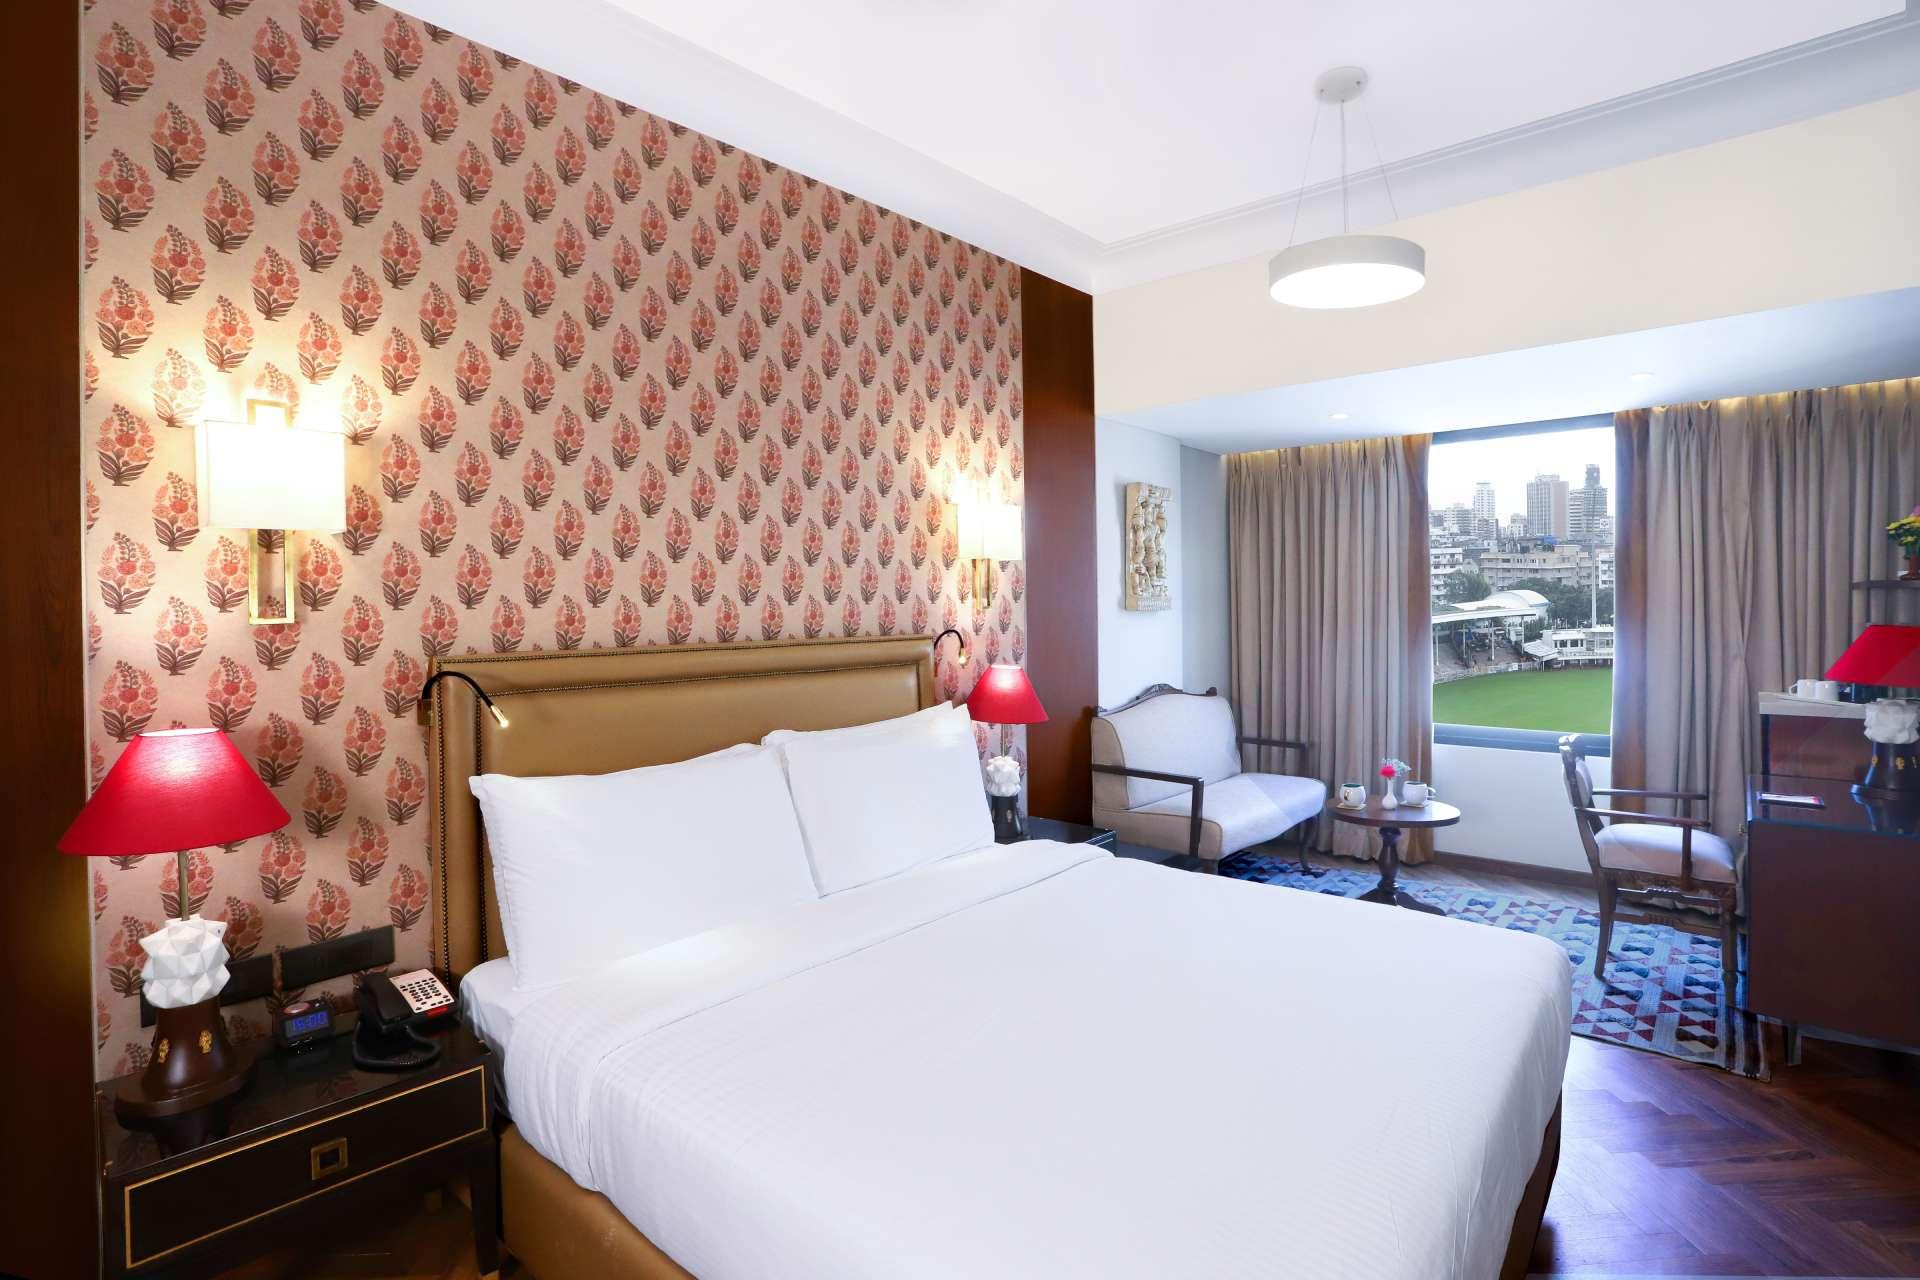 premium room 510 ambassaodor hotel 3 - The Ambassador   Heritage Hotels in Mumbai, Aurangabad, Chennai - Premium Room